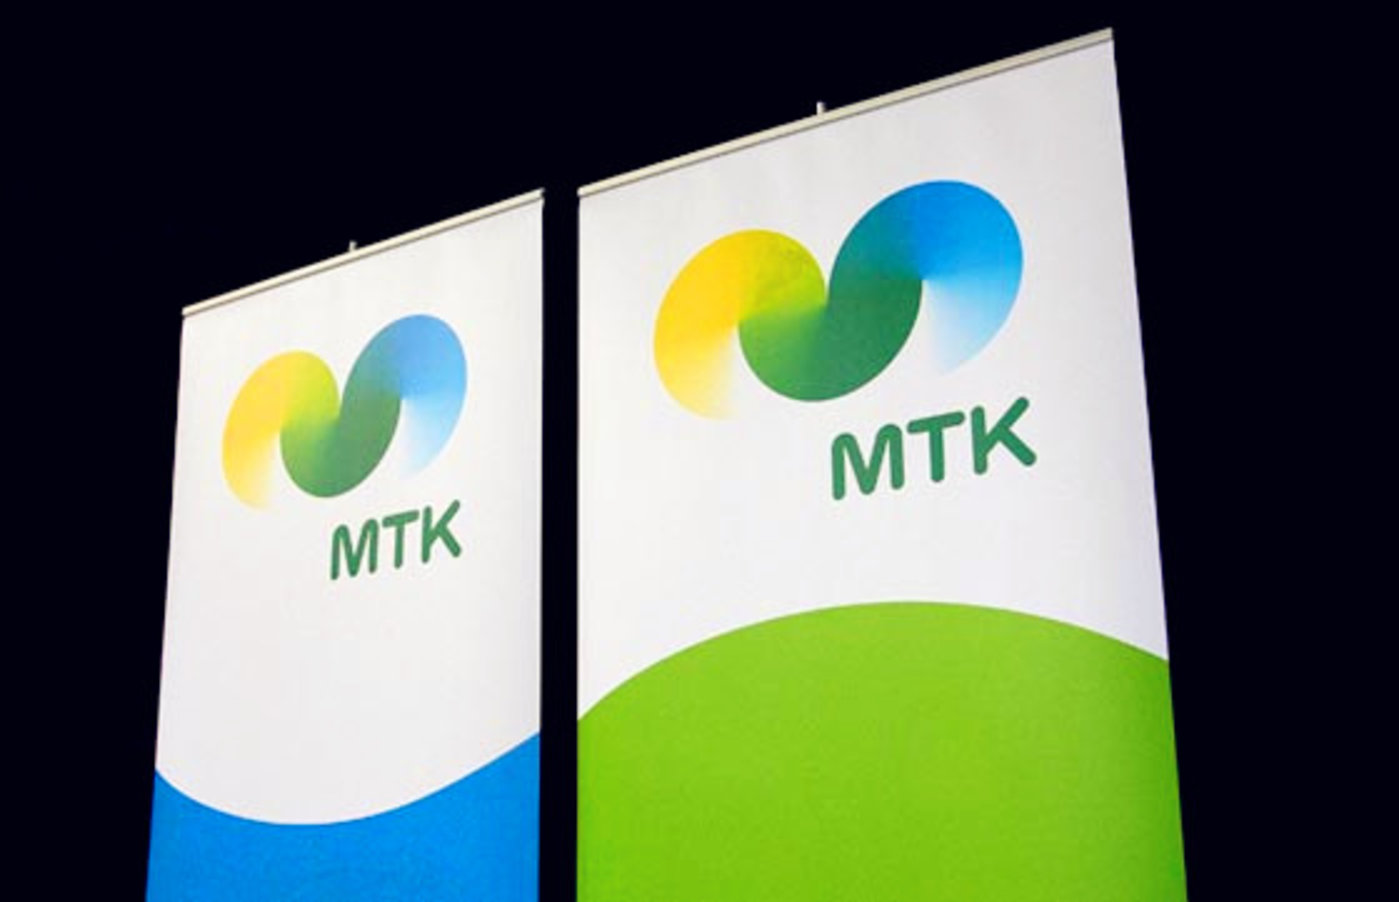 MTK山寨手机